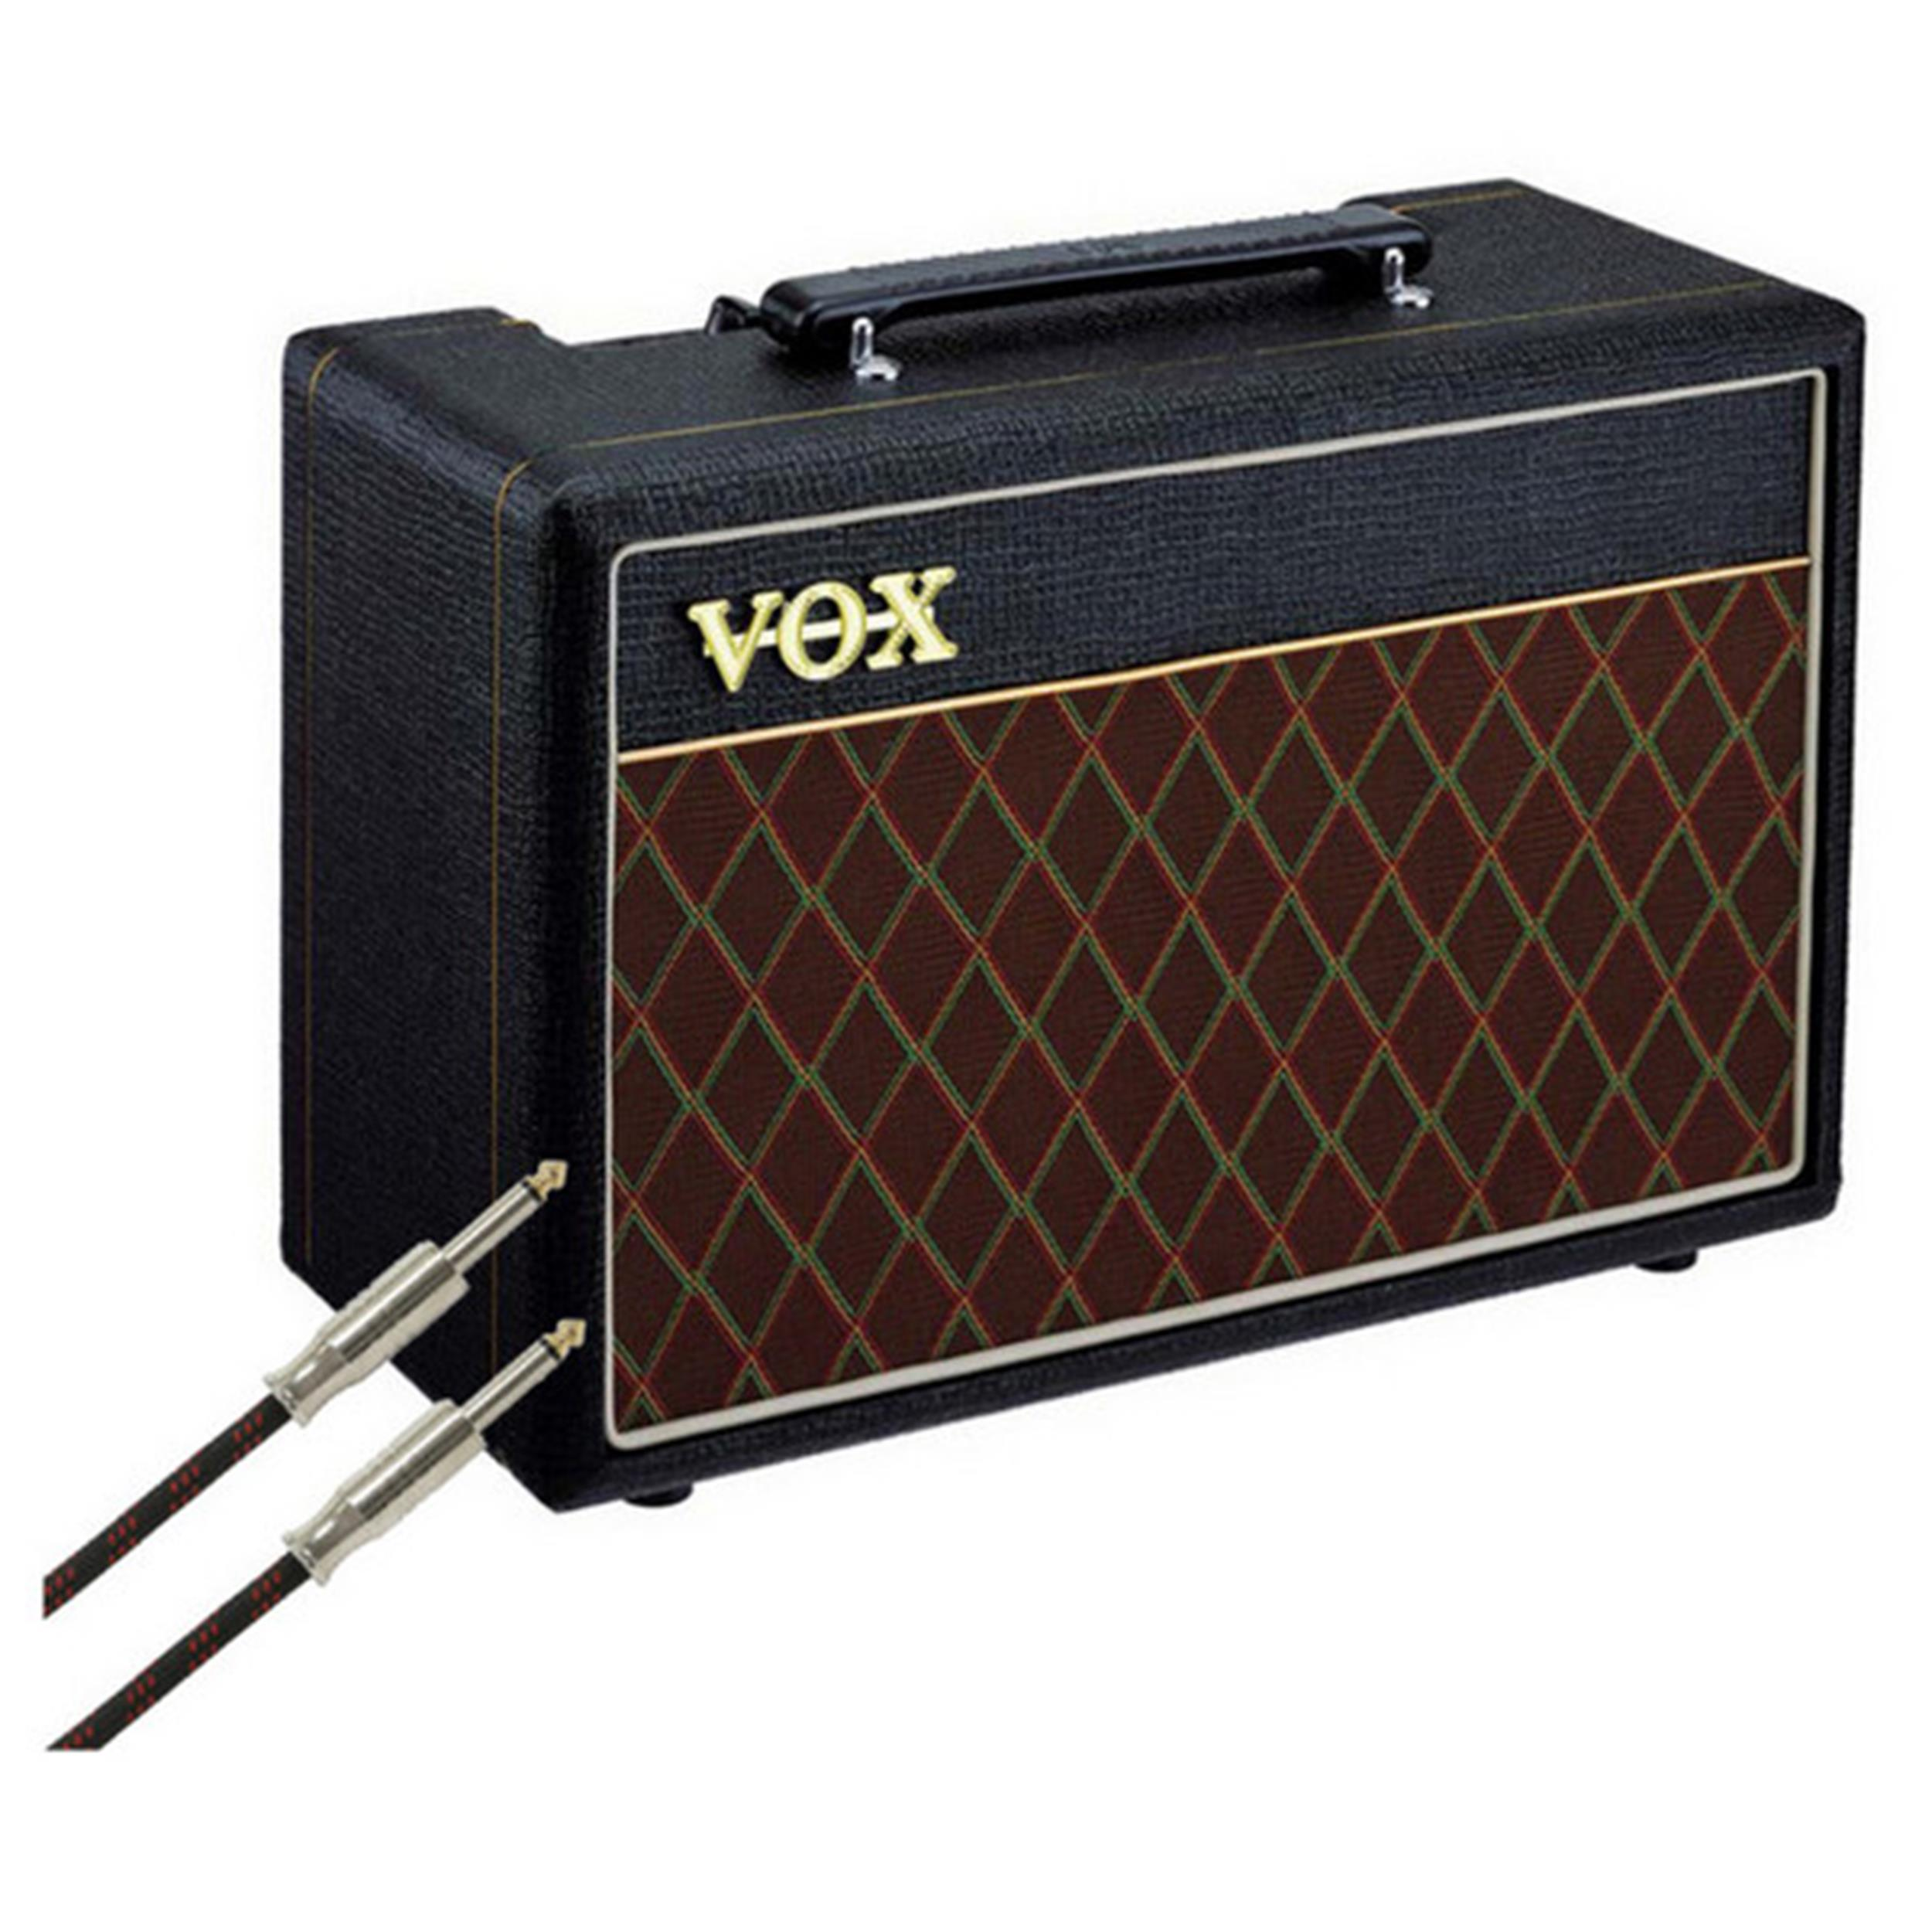 VOX PATHFINDER 10 COMBO